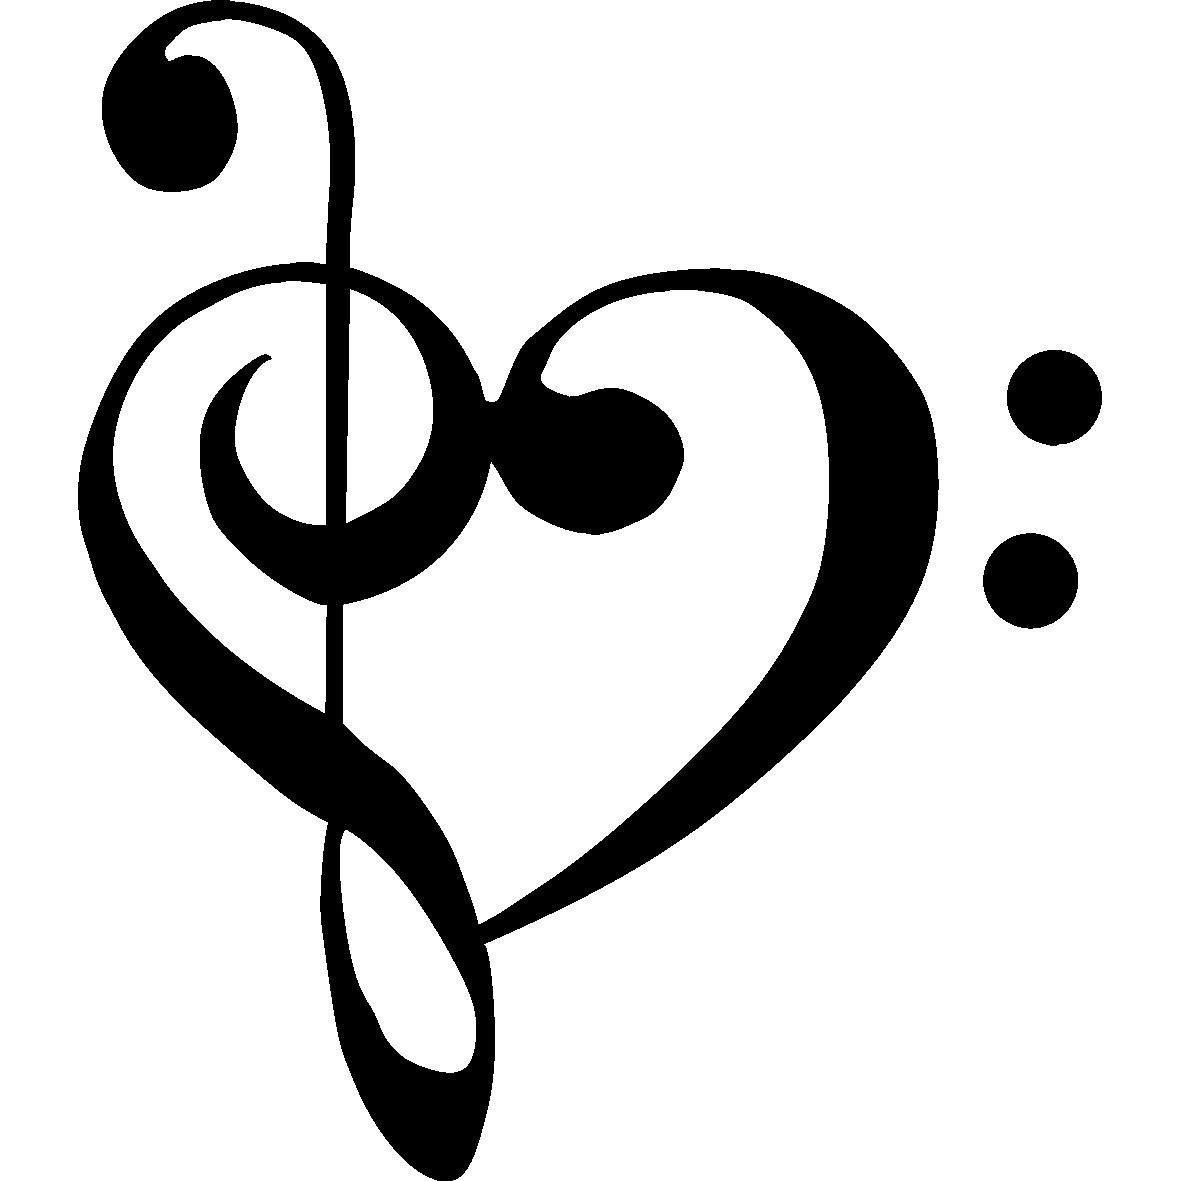 image bass clef treble clef heart jpg glee tv show wiki fandom rh glee wikia com treble clef heartbeat tattoo treble clef heart design